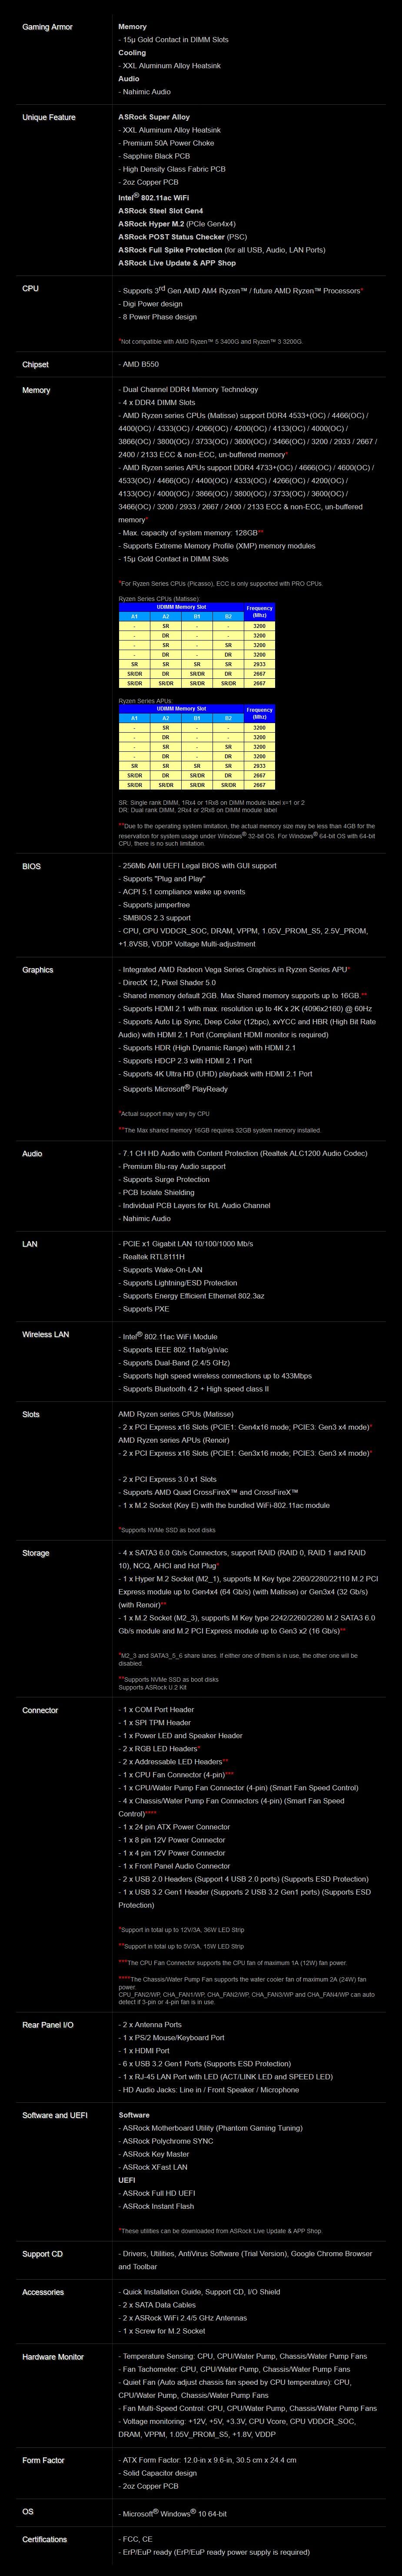 asrock-b550-phantom-gaming-4ac-am4-atx-motherboard-ac35648-7.jpg